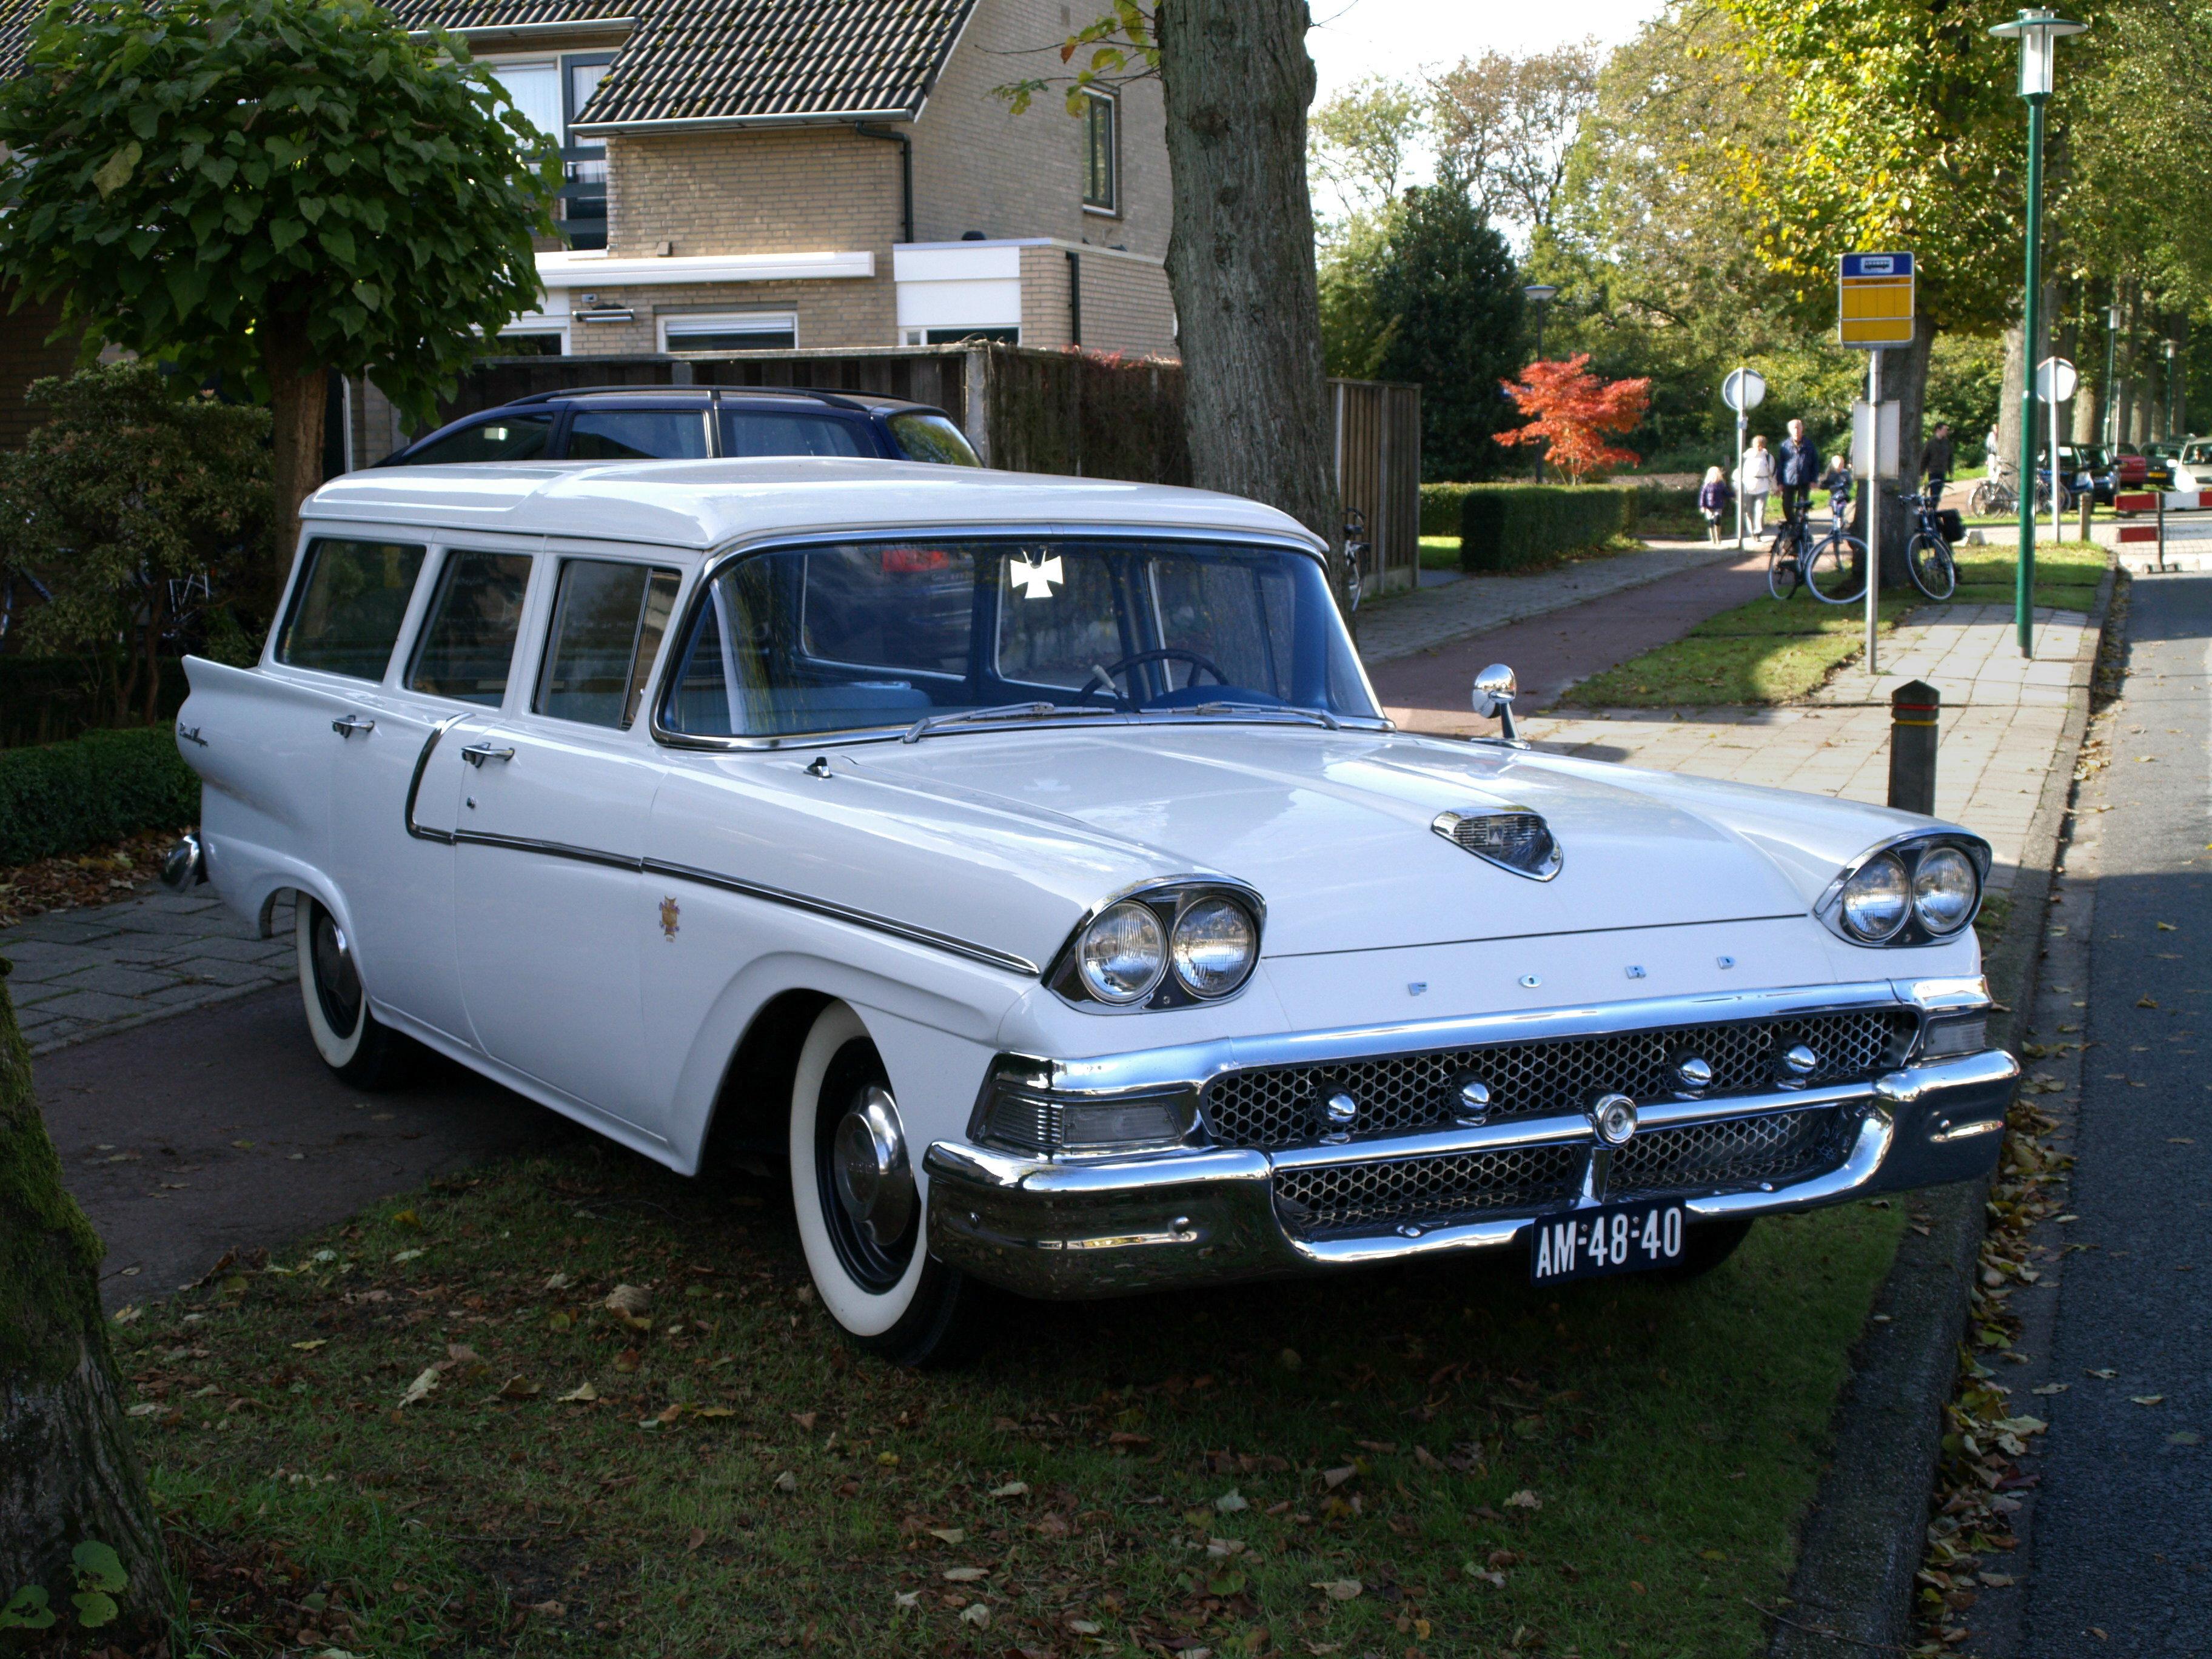 1957 ford station wagons for sale craigslist autos post. Black Bedroom Furniture Sets. Home Design Ideas